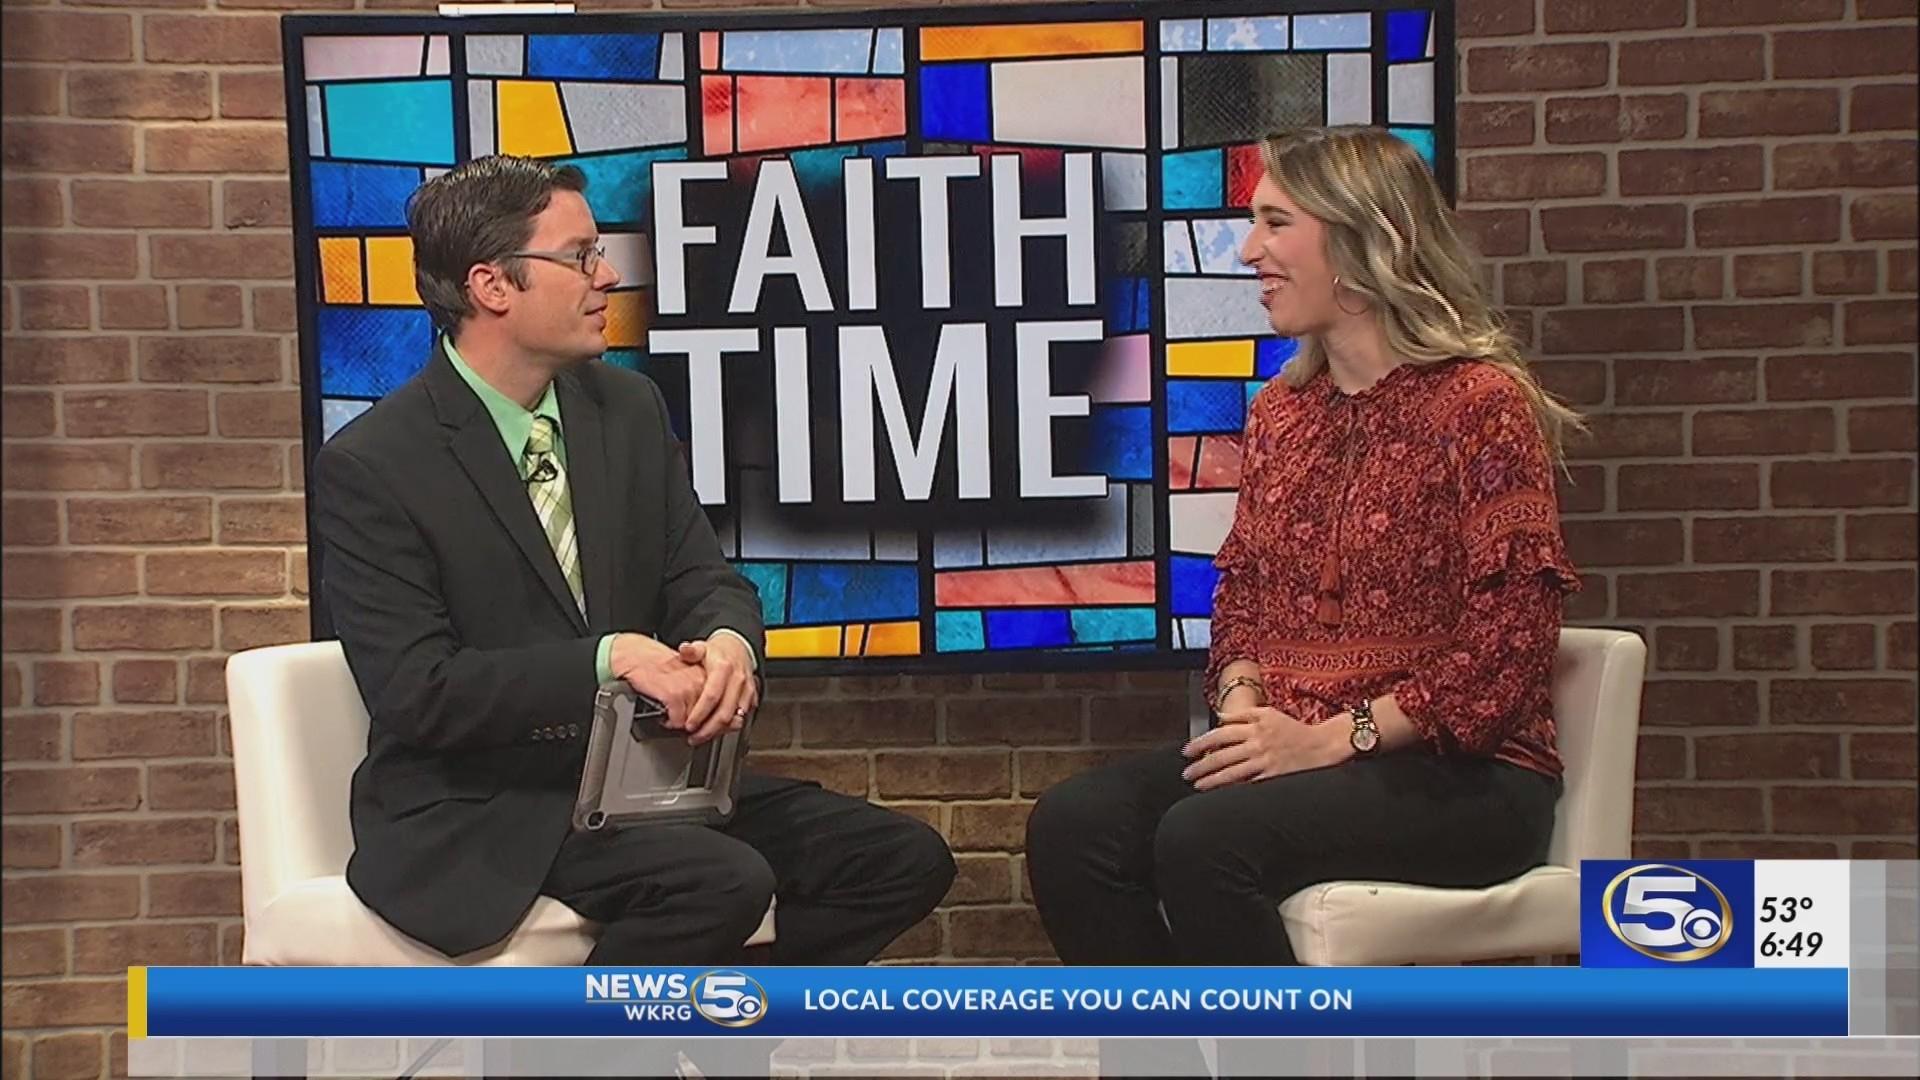 Faith_Time___Children_s_ministry_0_20181104130306